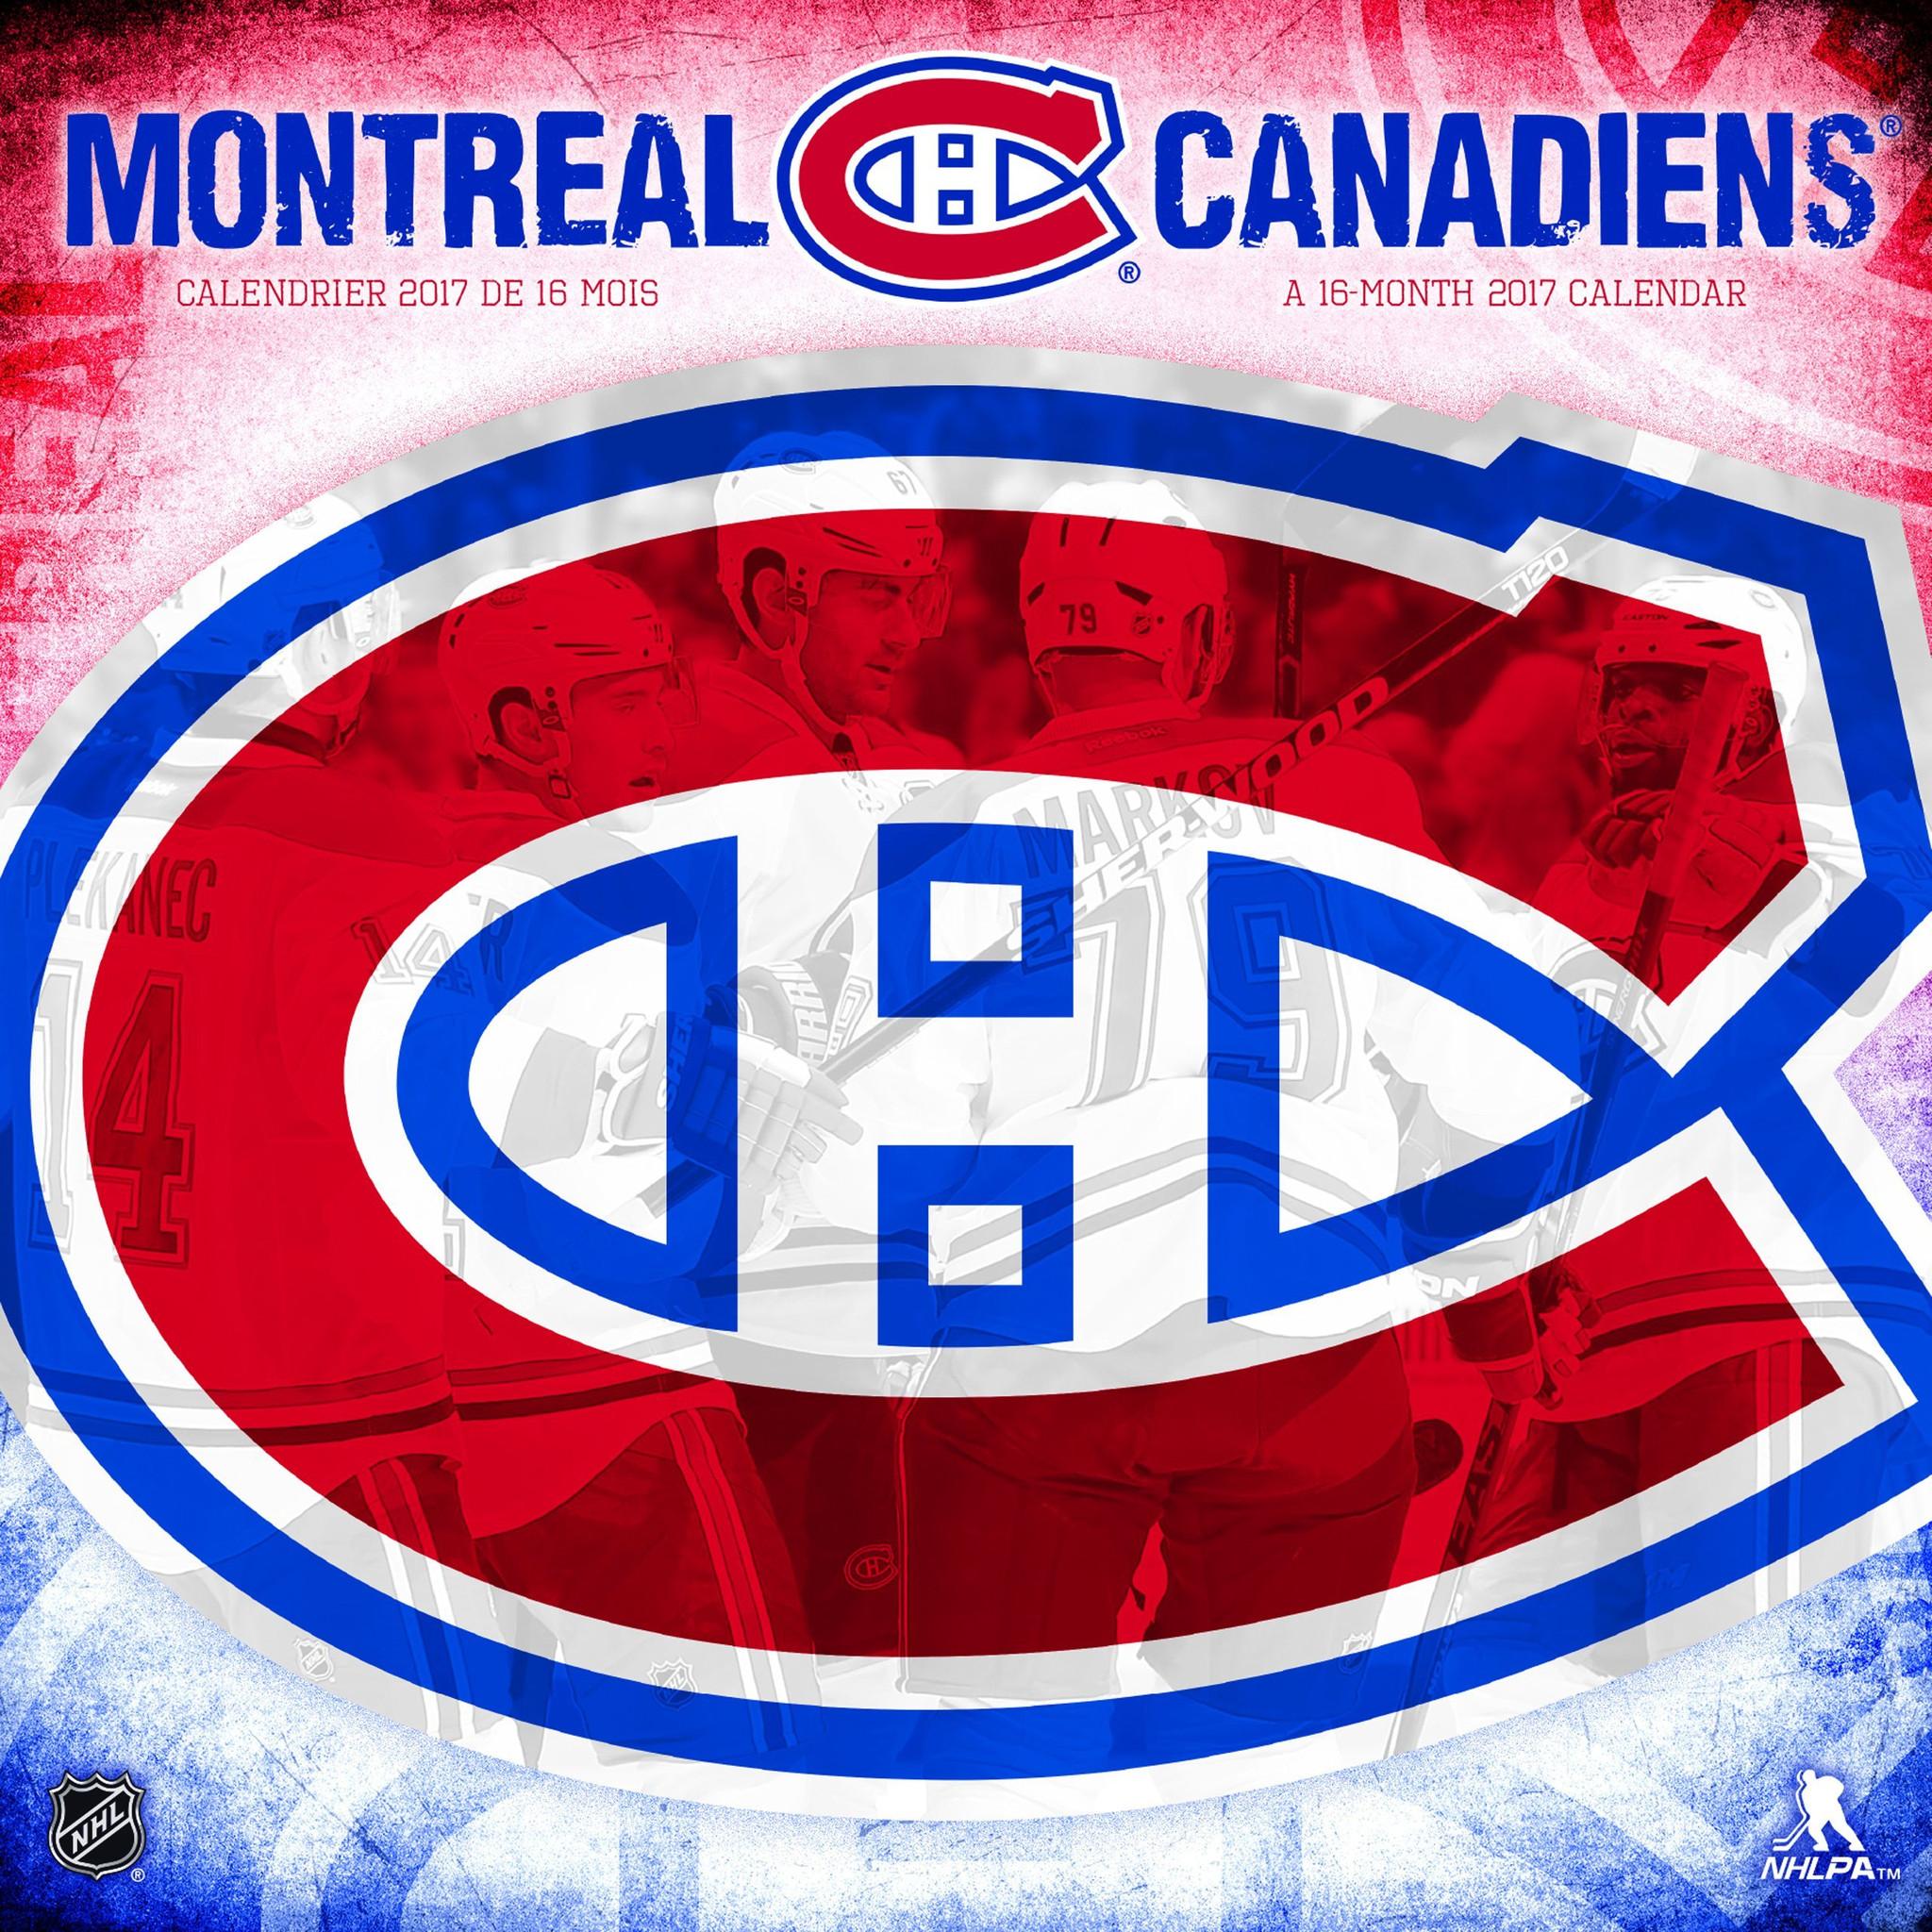 Images Of Montreal Canadiens Canadien De Montreal 2017 2048x2048 Wallpaper Teahub Io